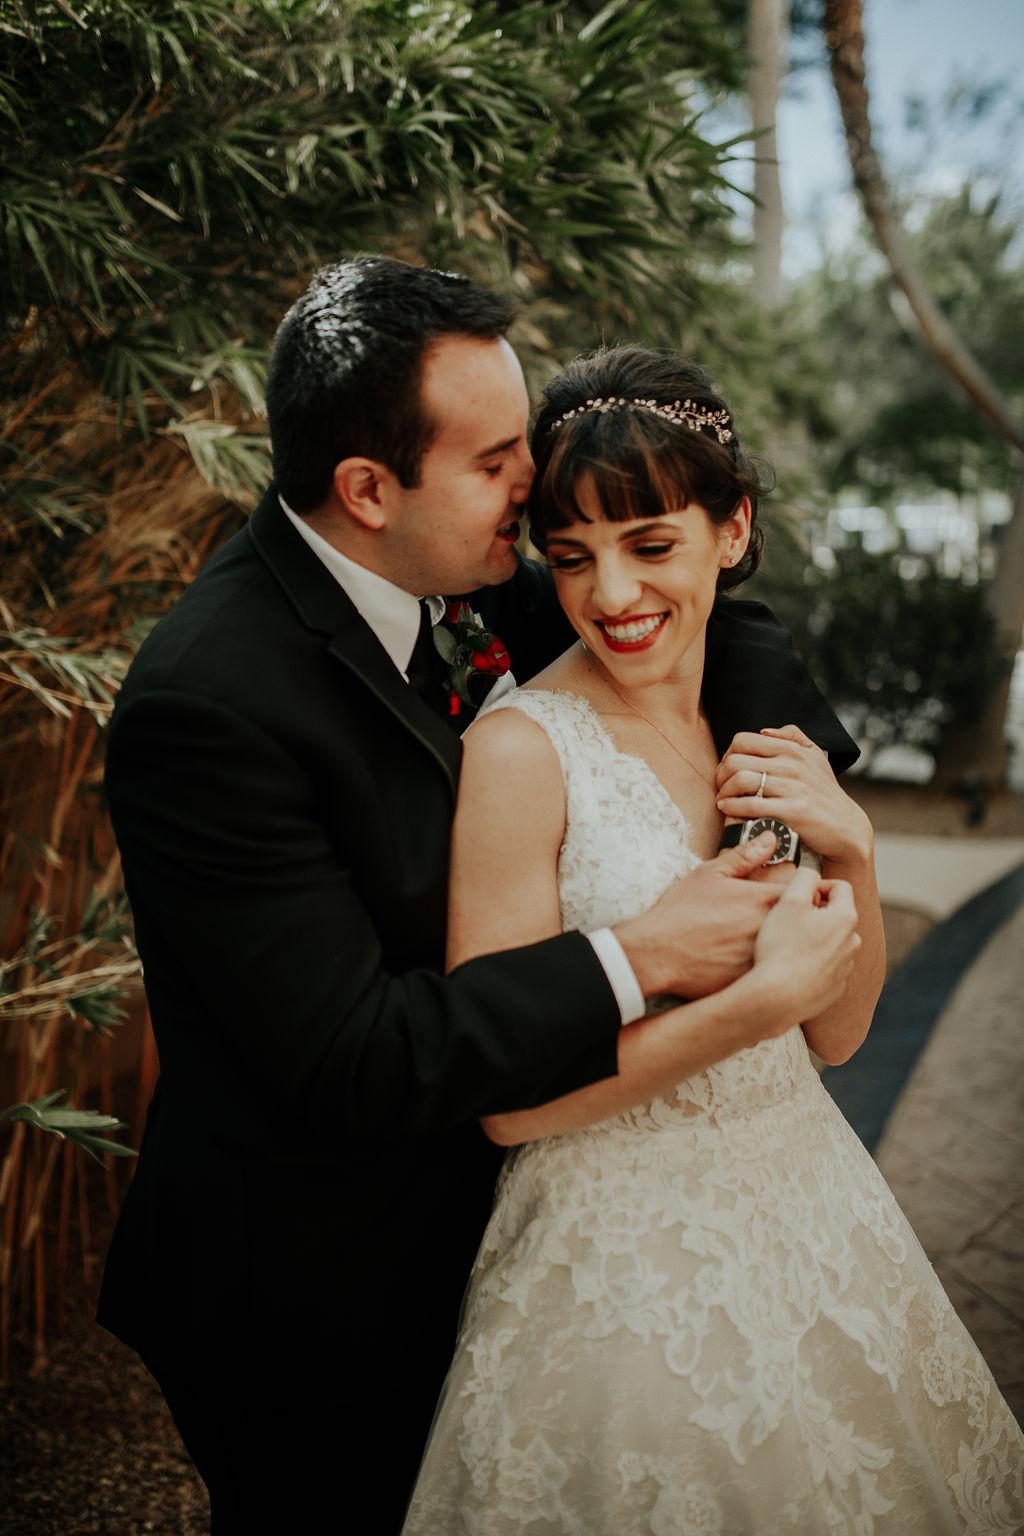 Wedding at Green Valley Ranch